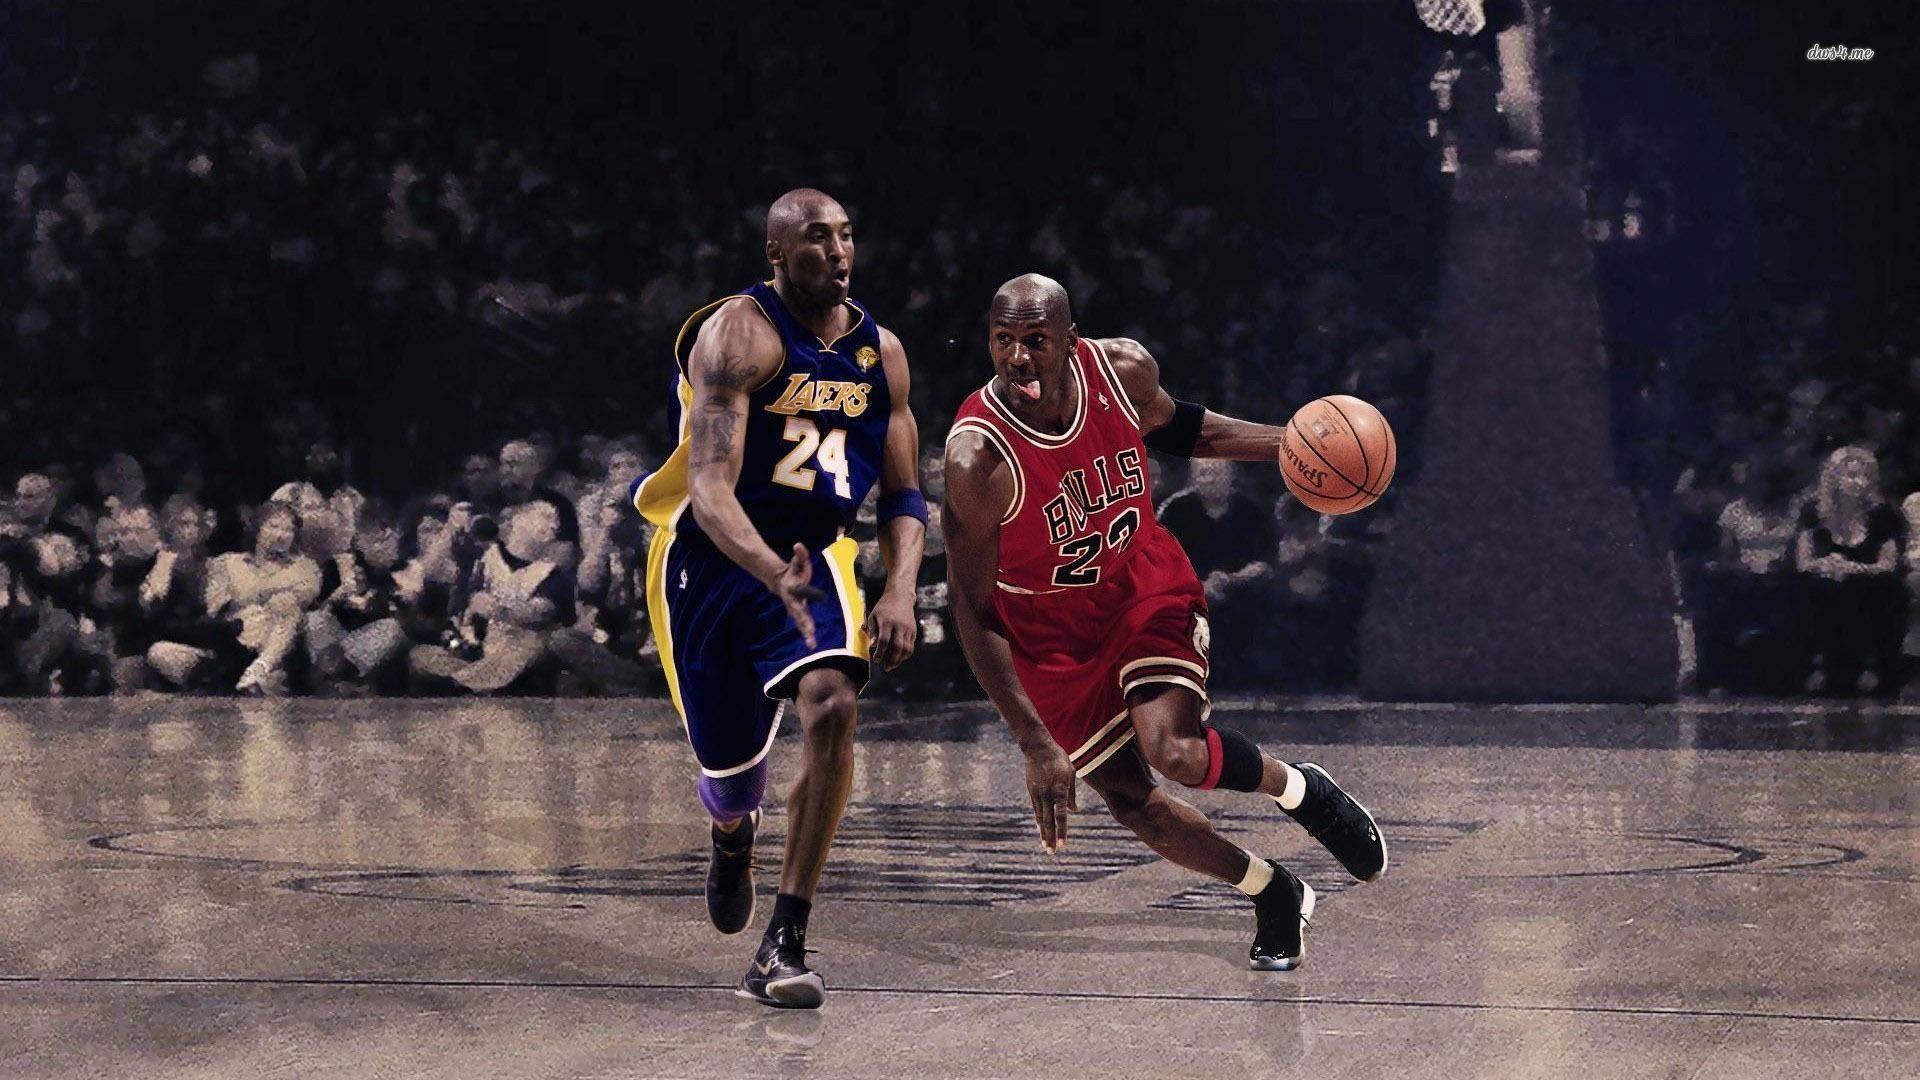 Michael Jordan Wallpaper High Definition Flip Wallpapers Download Free Wallpaper Hd Kobe Vs Jordan Shaq And Kobe Basketball Wallpaper